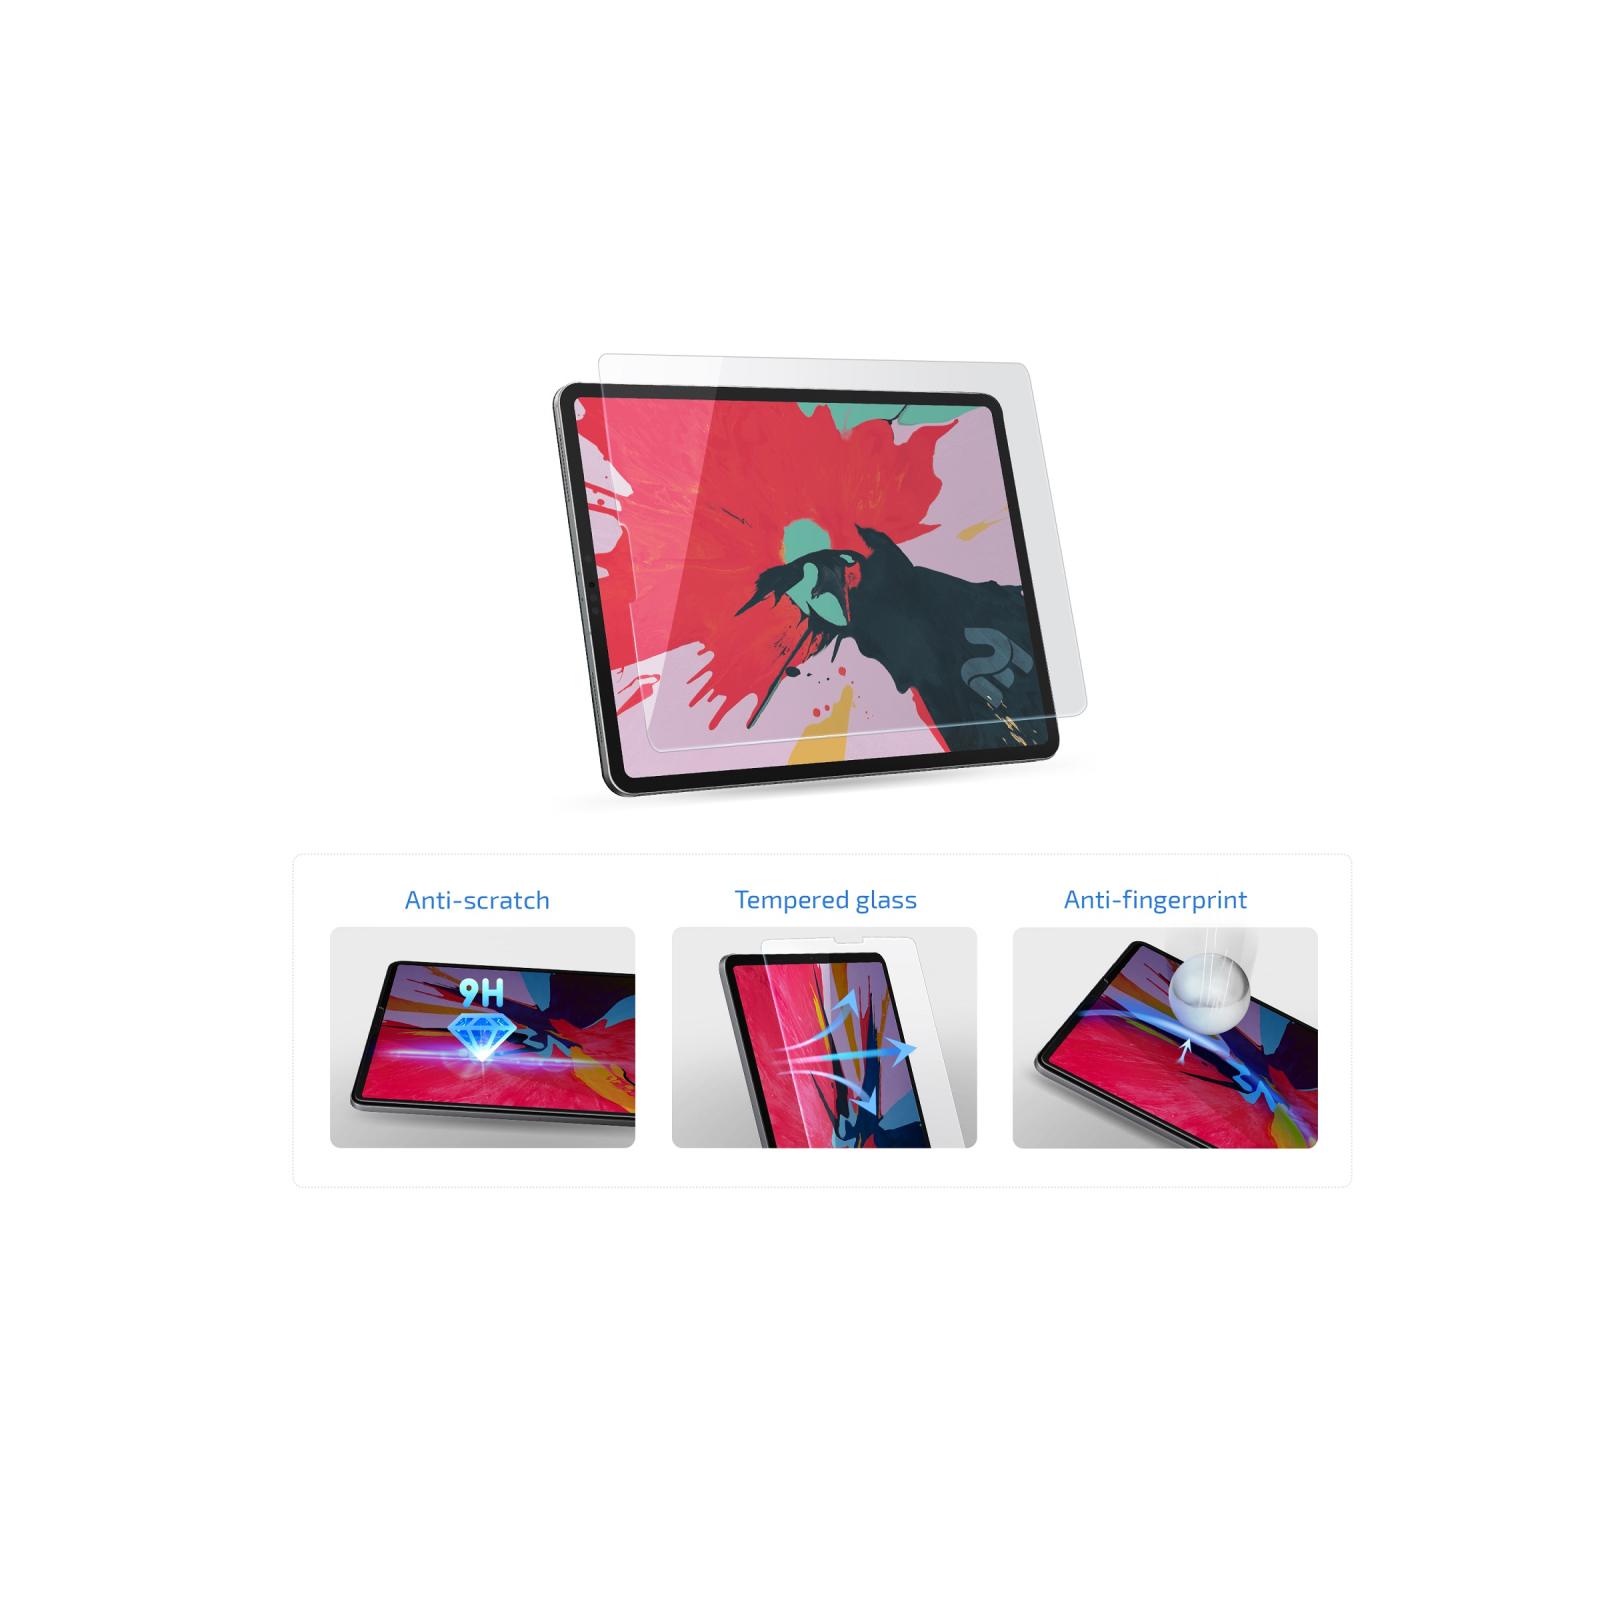 Стекло защитное 2E Xiaomi Mi Pad 4 WiFi / LTE, 2.5D, Clear (2E-MI-PAD4-LT25D-CL) изображение 3